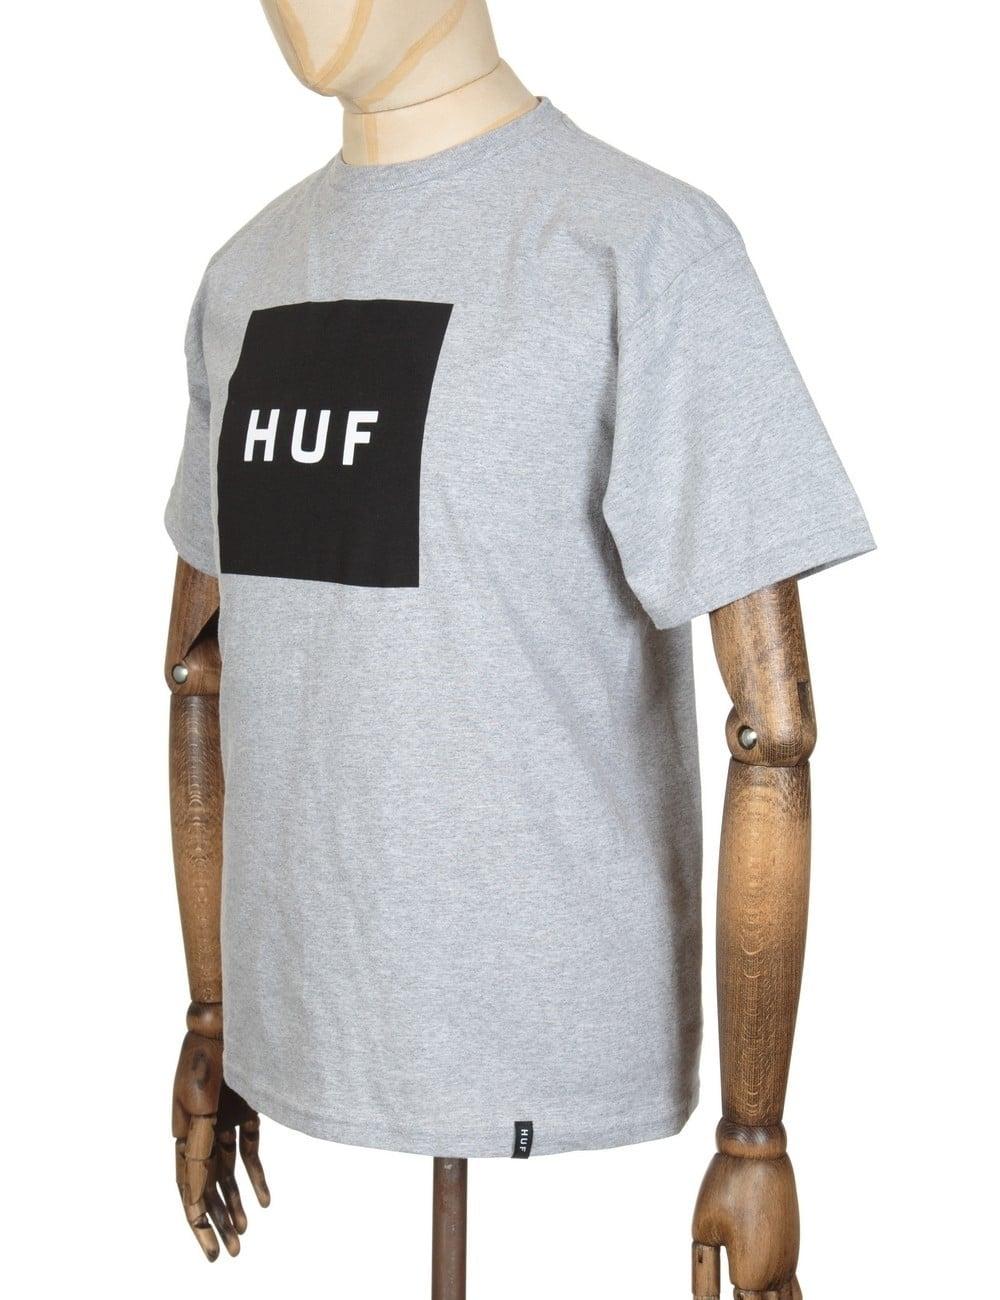 6249439895f69 Huf Box Logo T-shirt - Heather Grey - Clothing from Fat Buddha Store UK